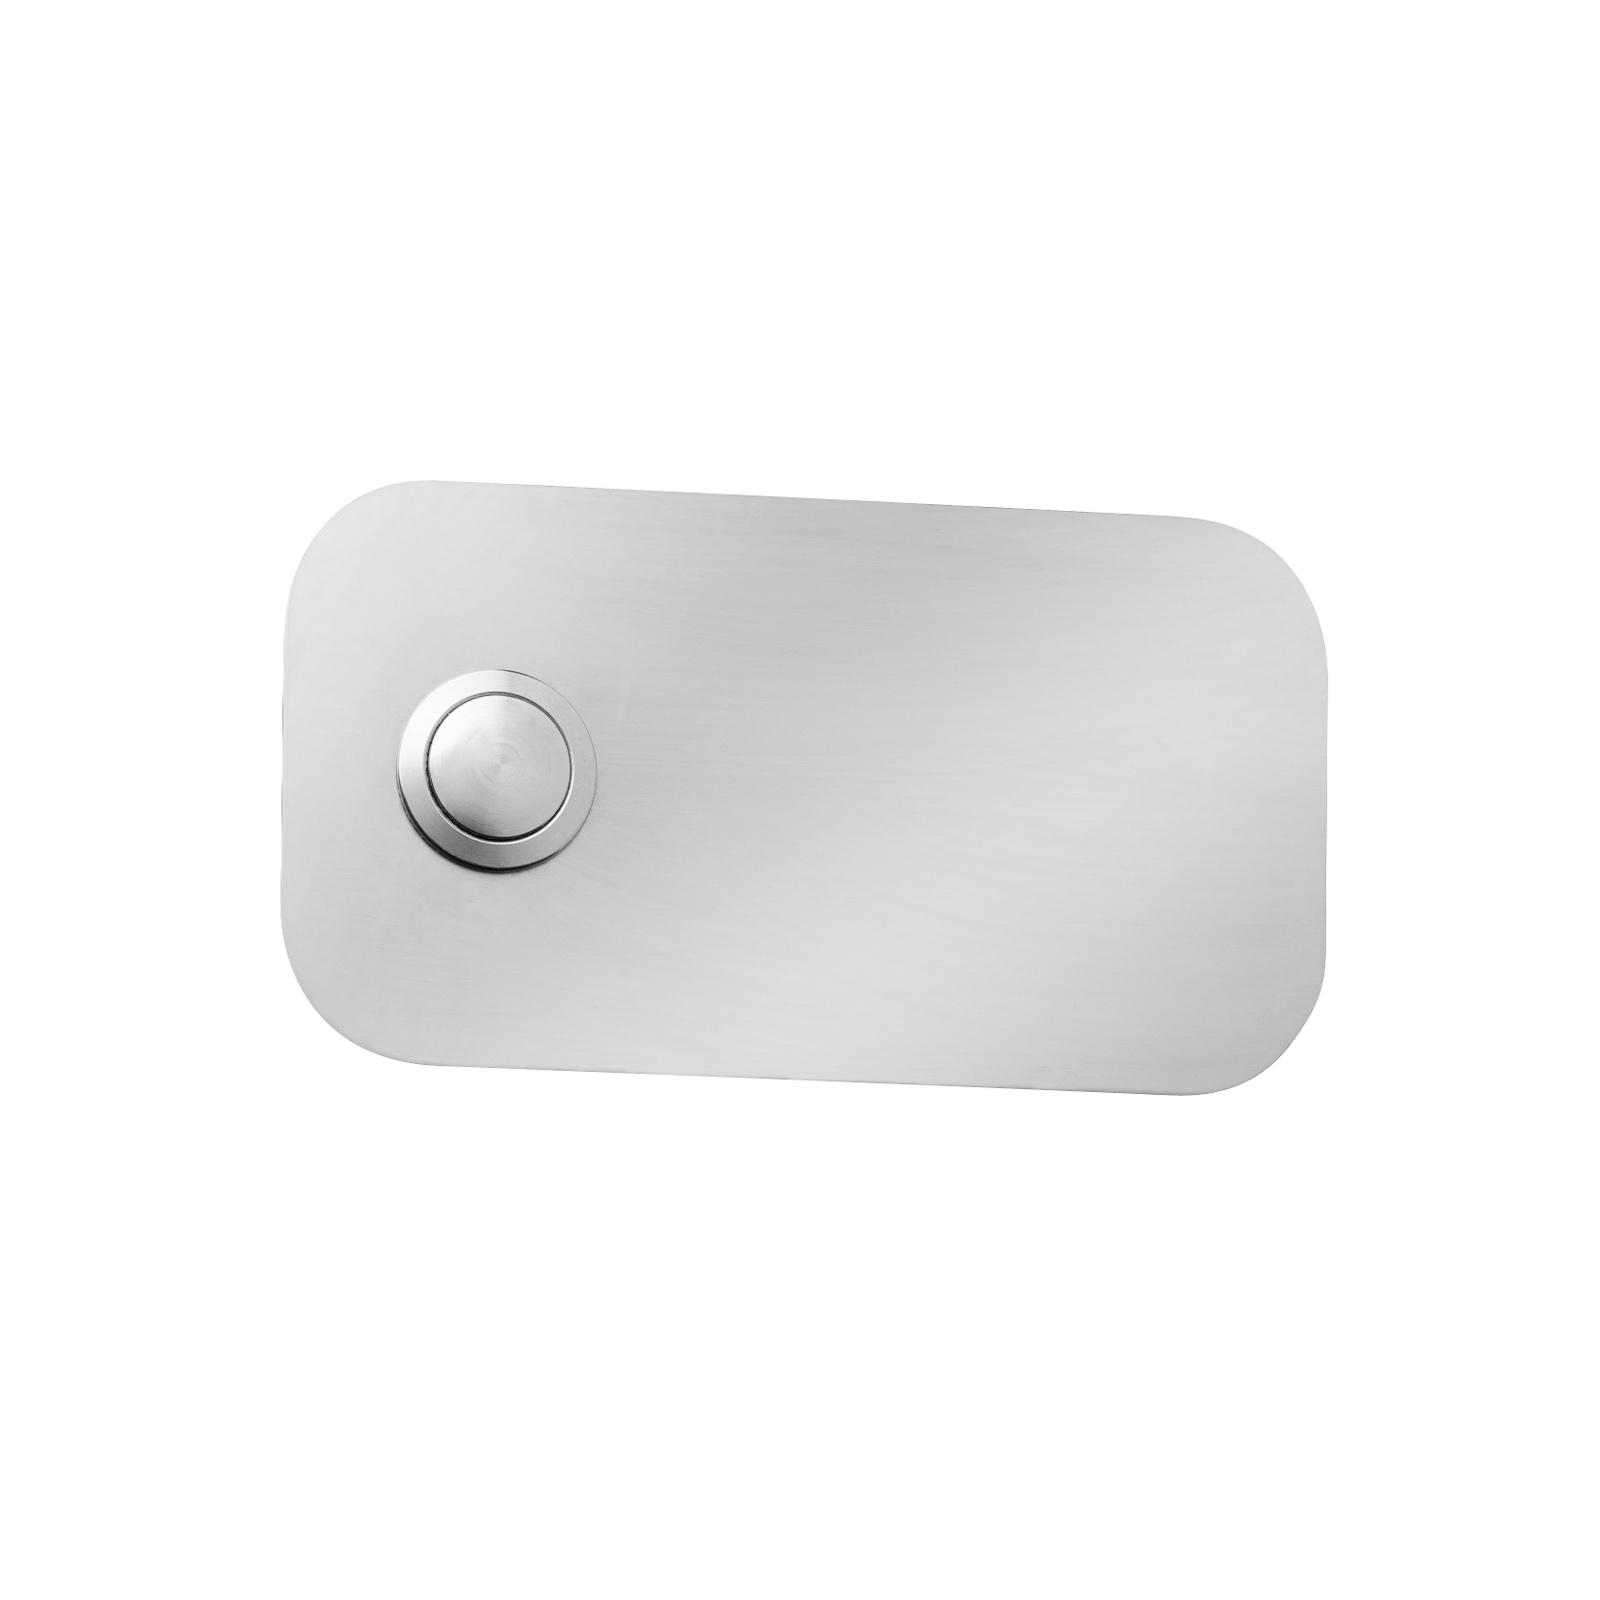 Placa de timbre rectangular de acero inoxidable